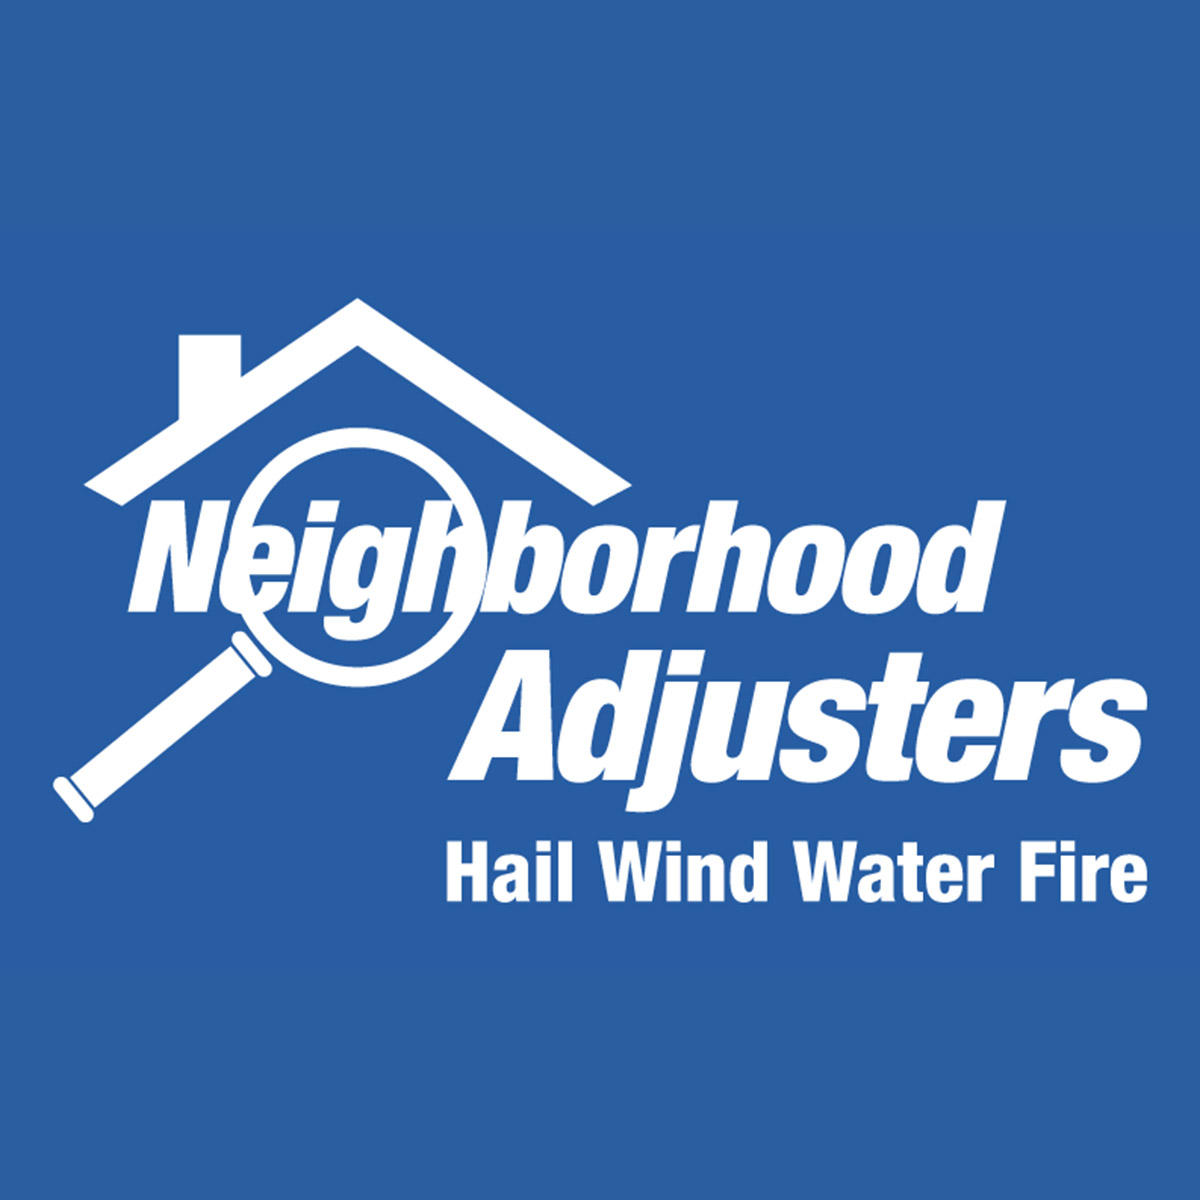 Neighborhood Adjusters